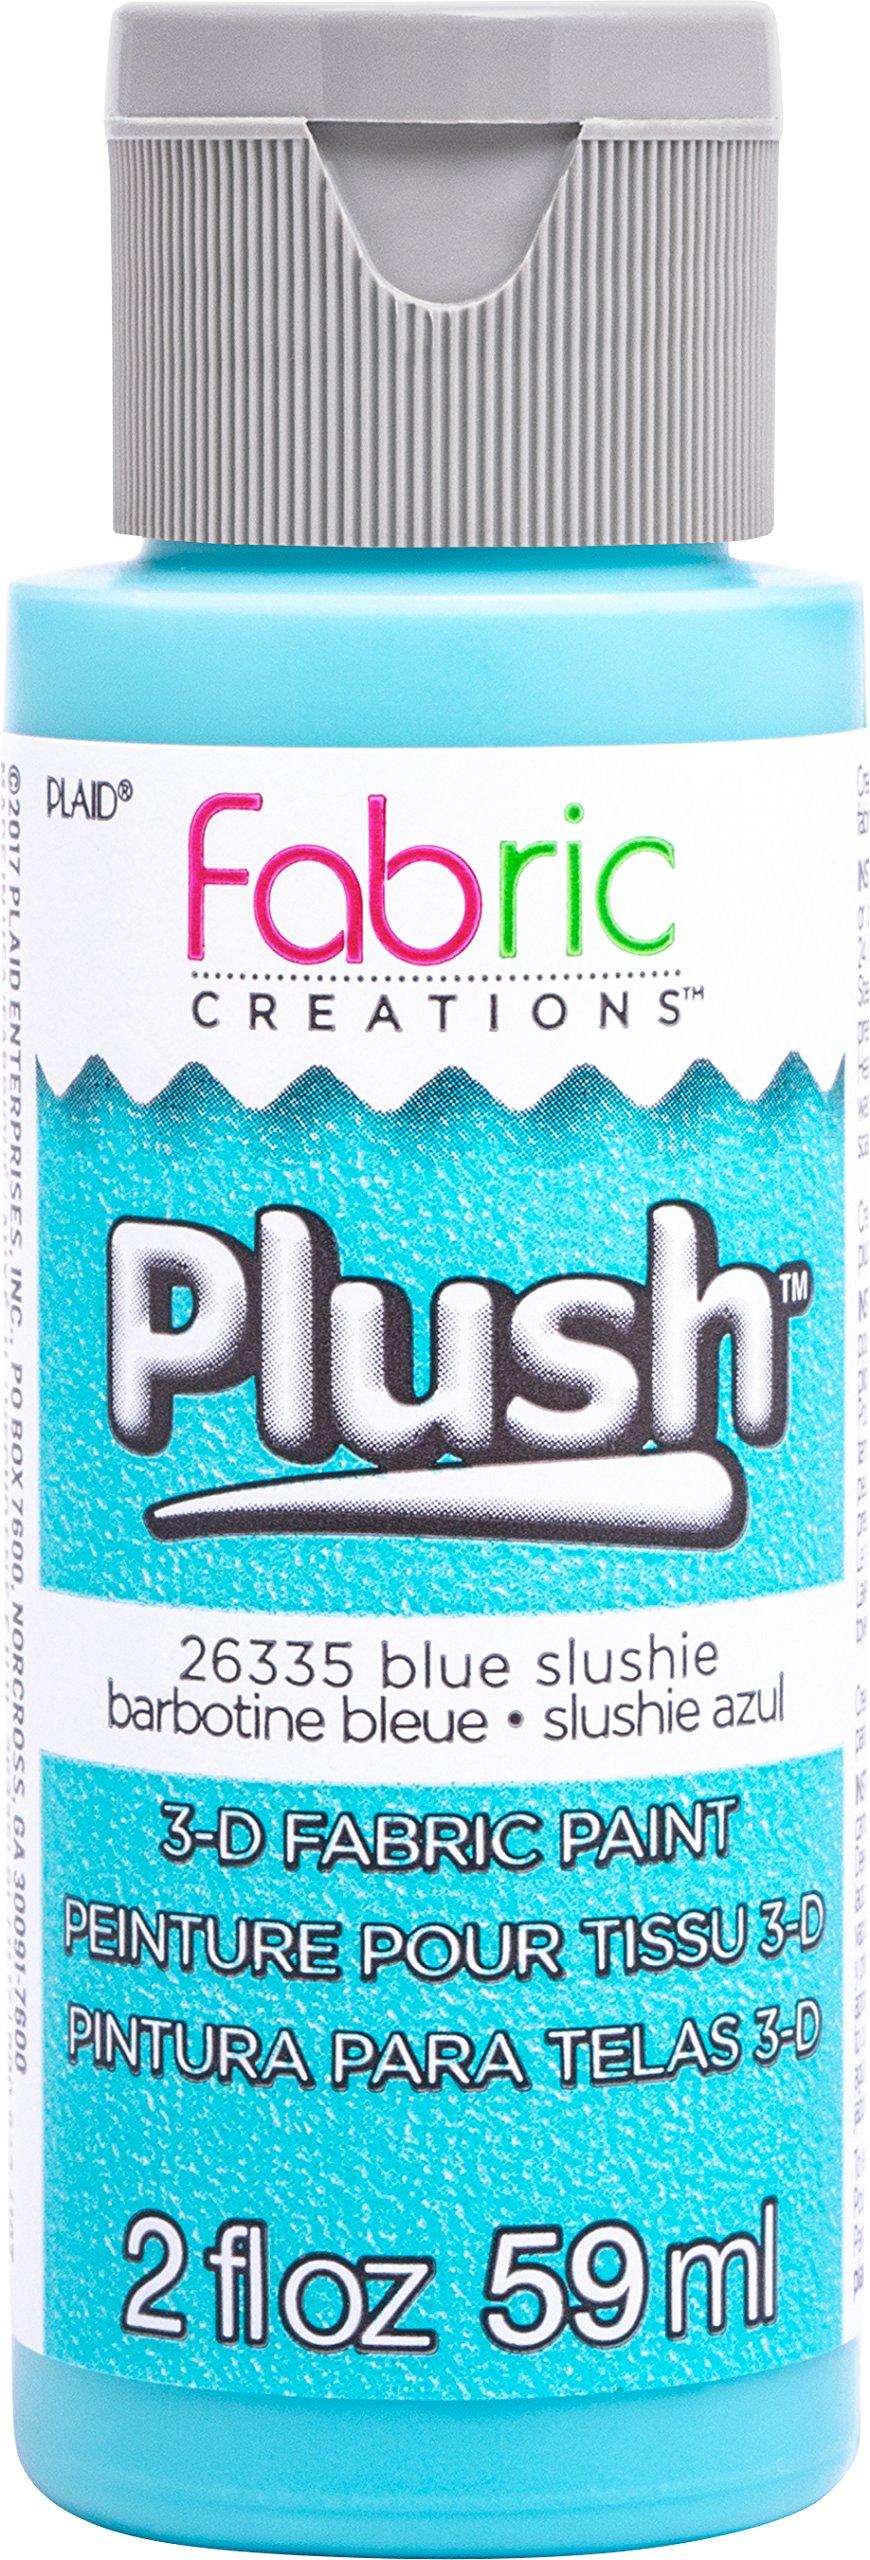 Fabric Creations 3-D Plush Fabric Paint, 2 oz, Blue Slushie